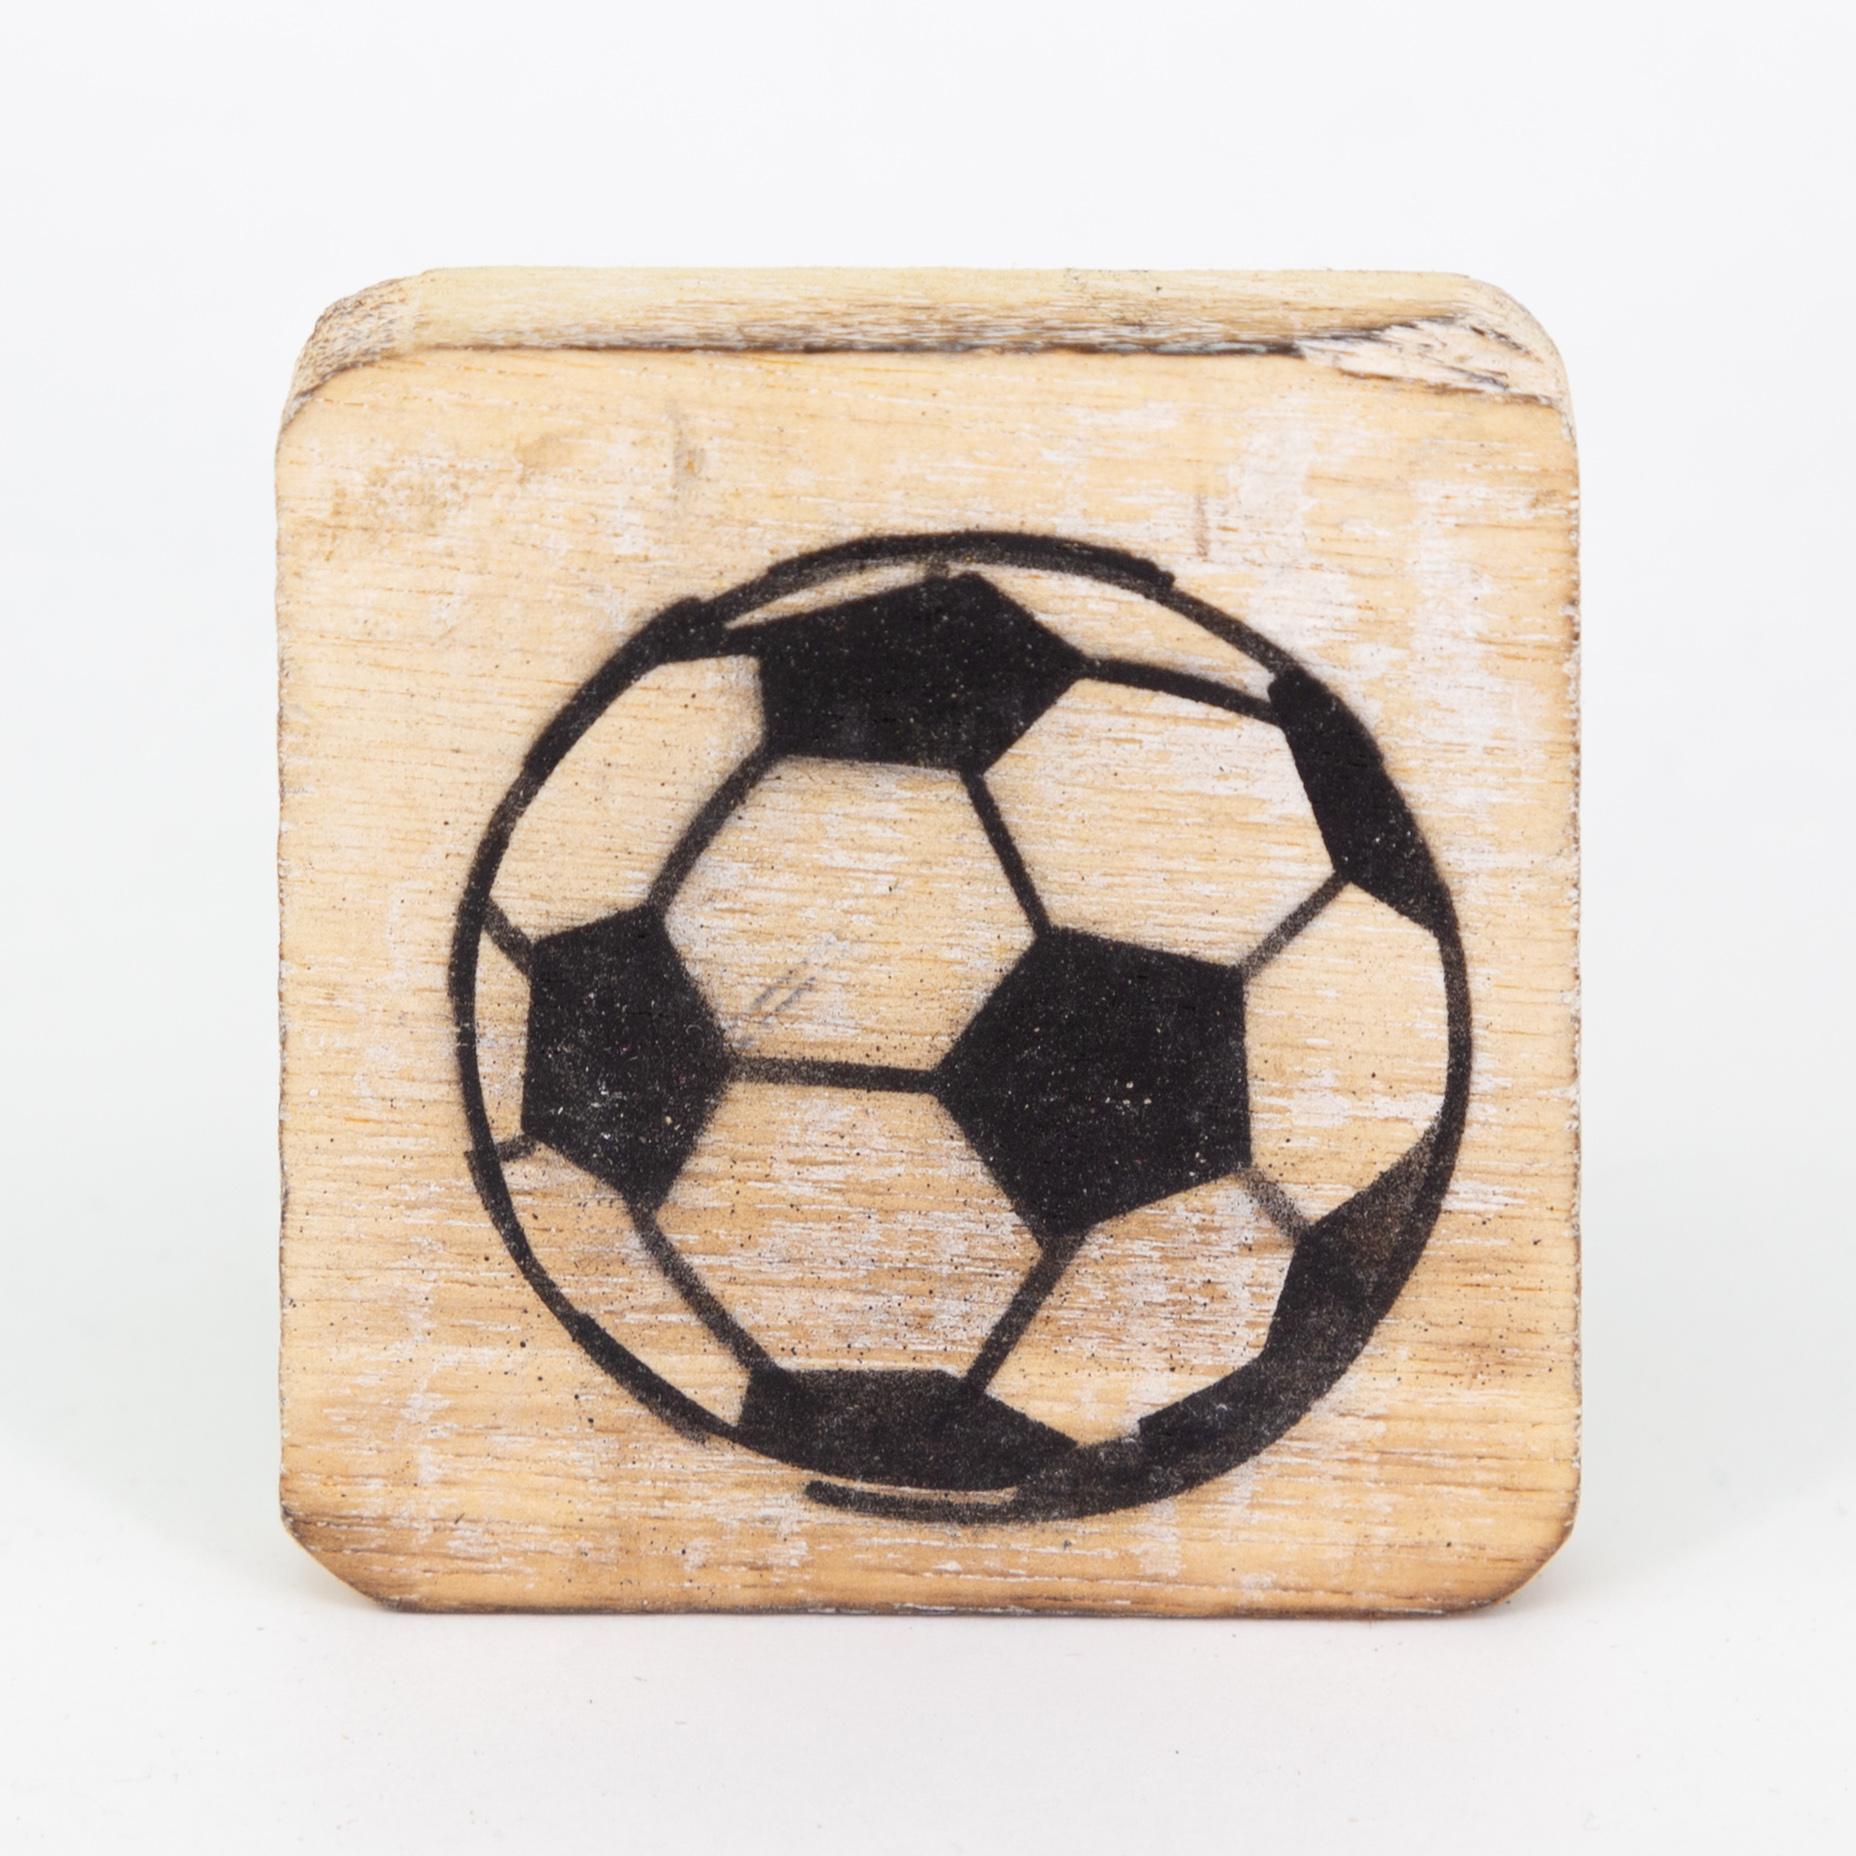 Holzsymbol - Fussball - im Scrabble-Style